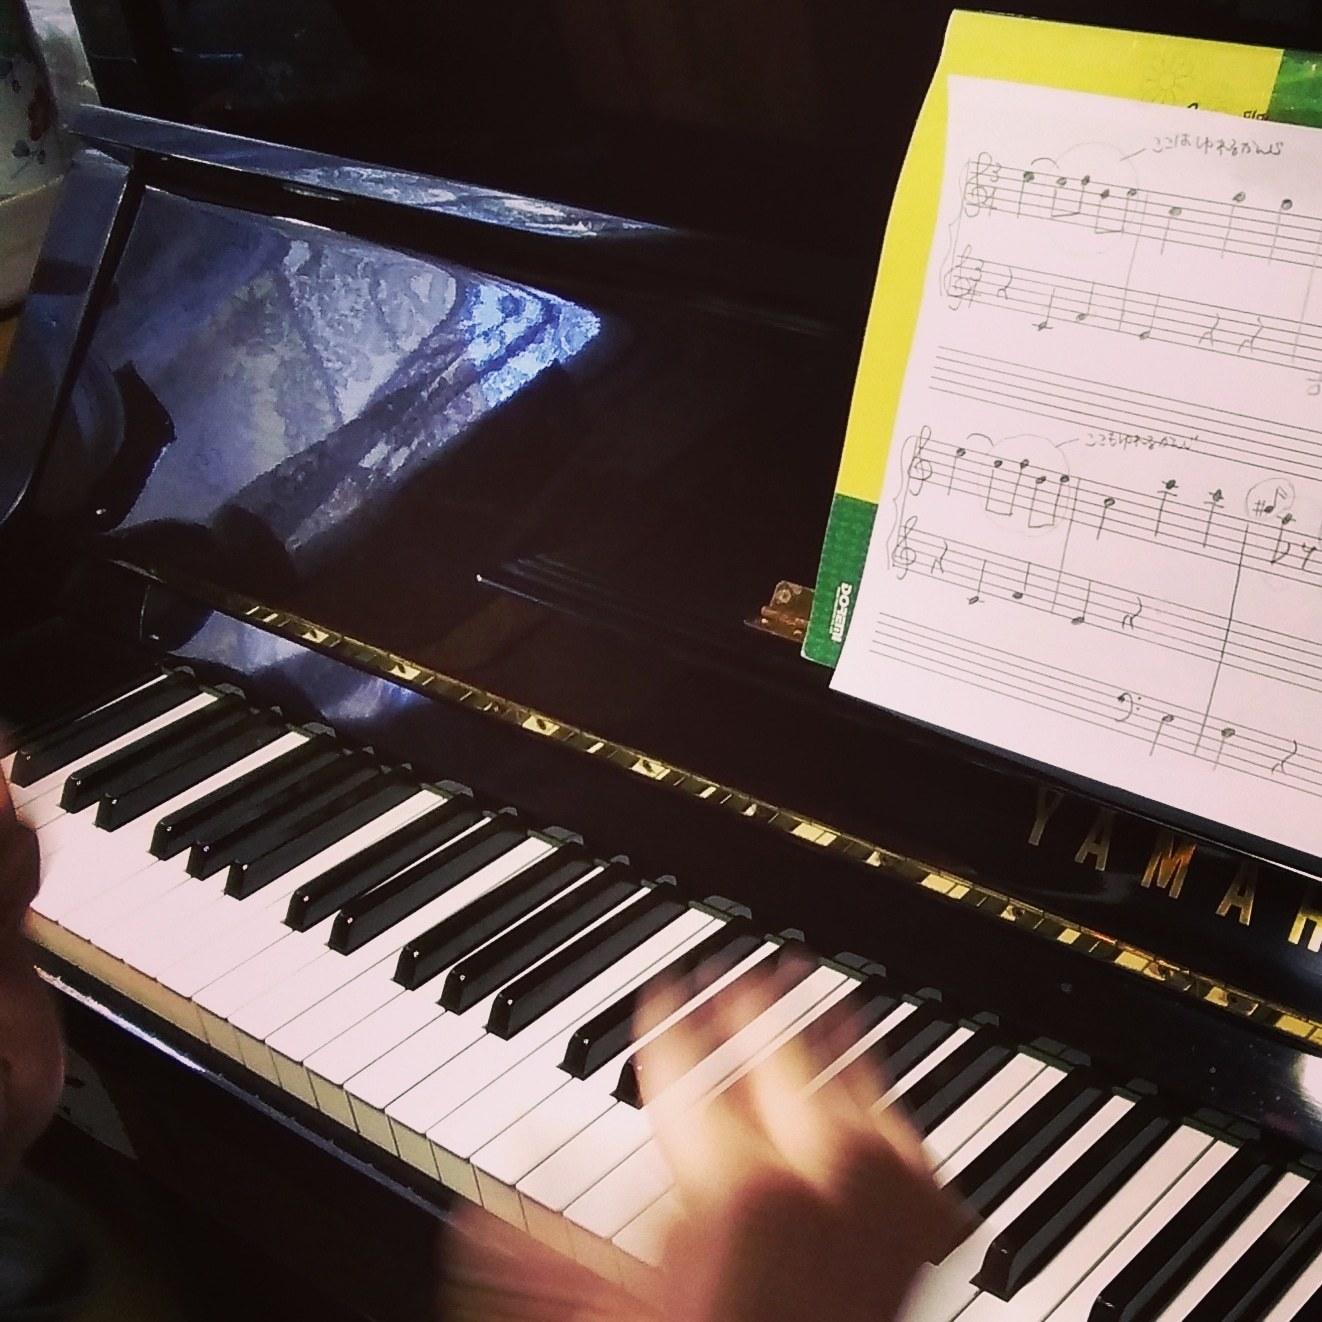 R・ピアノ教室 2019.4.30 フランツ・ヨーゼフ・ハイドン《2》_b0169513_17535128.jpg